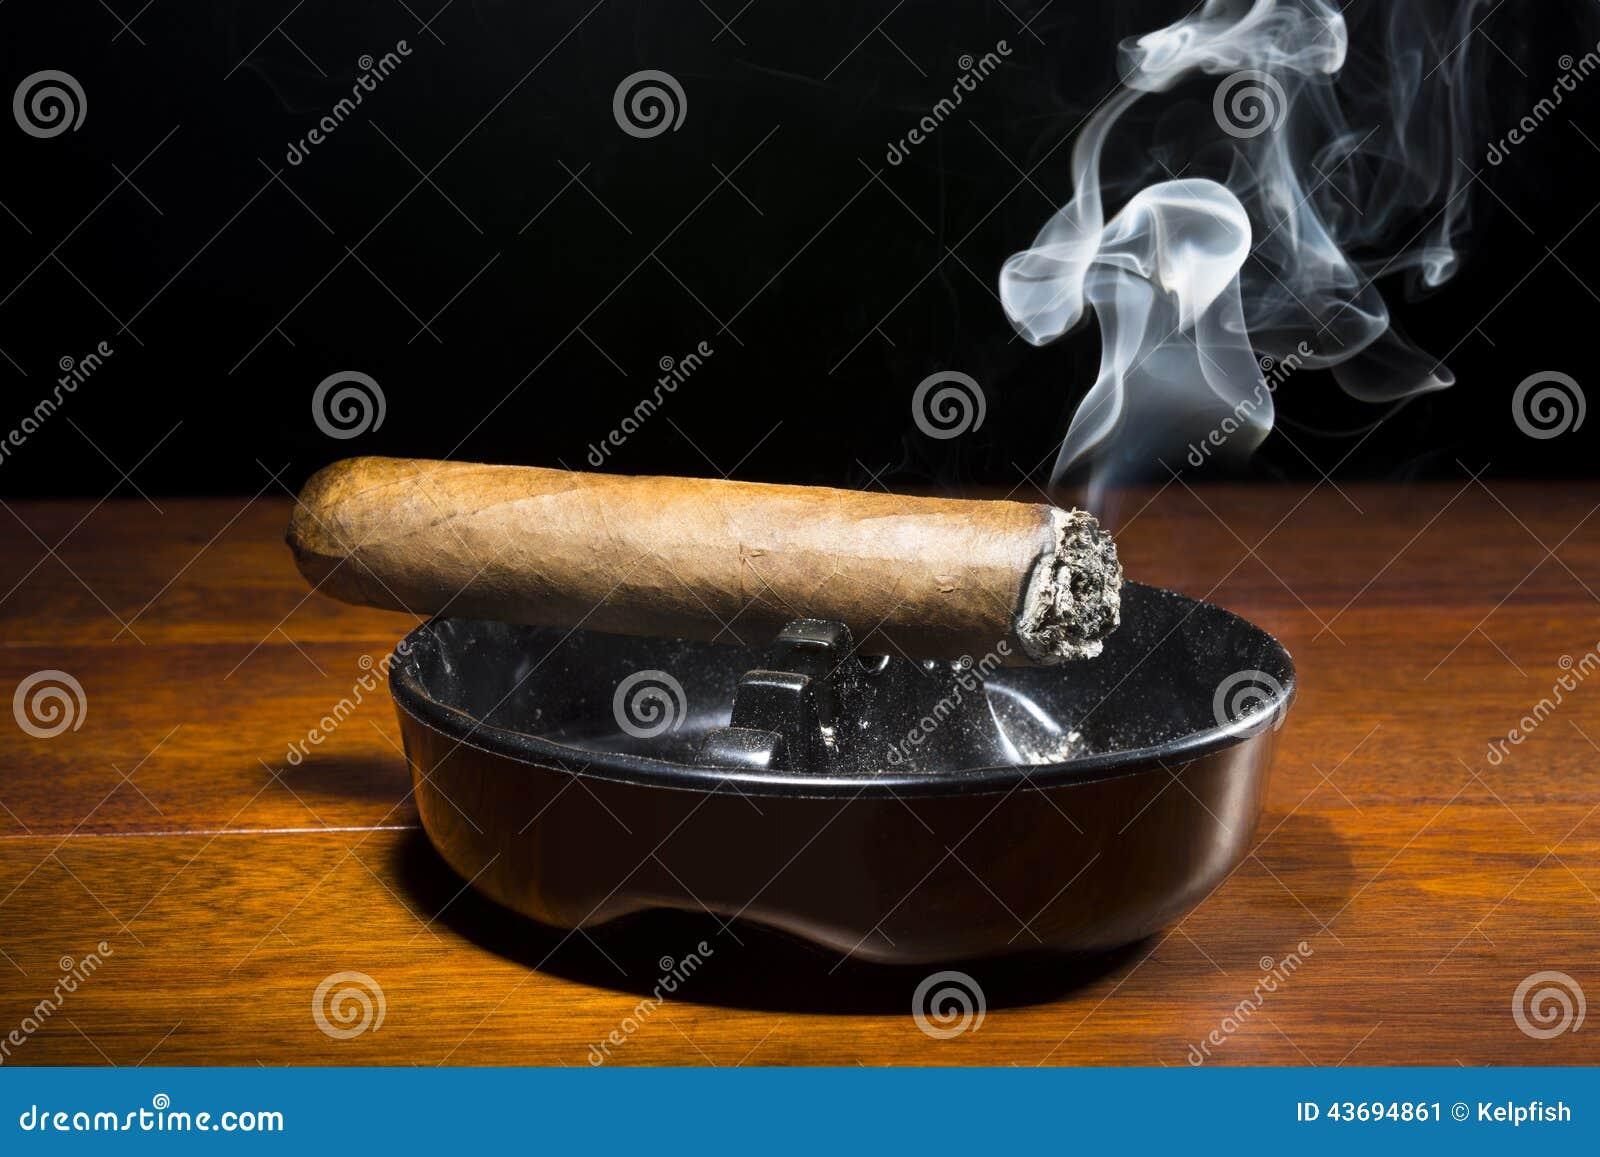 Cigar In Ashtray Stock Photo Image 43694861